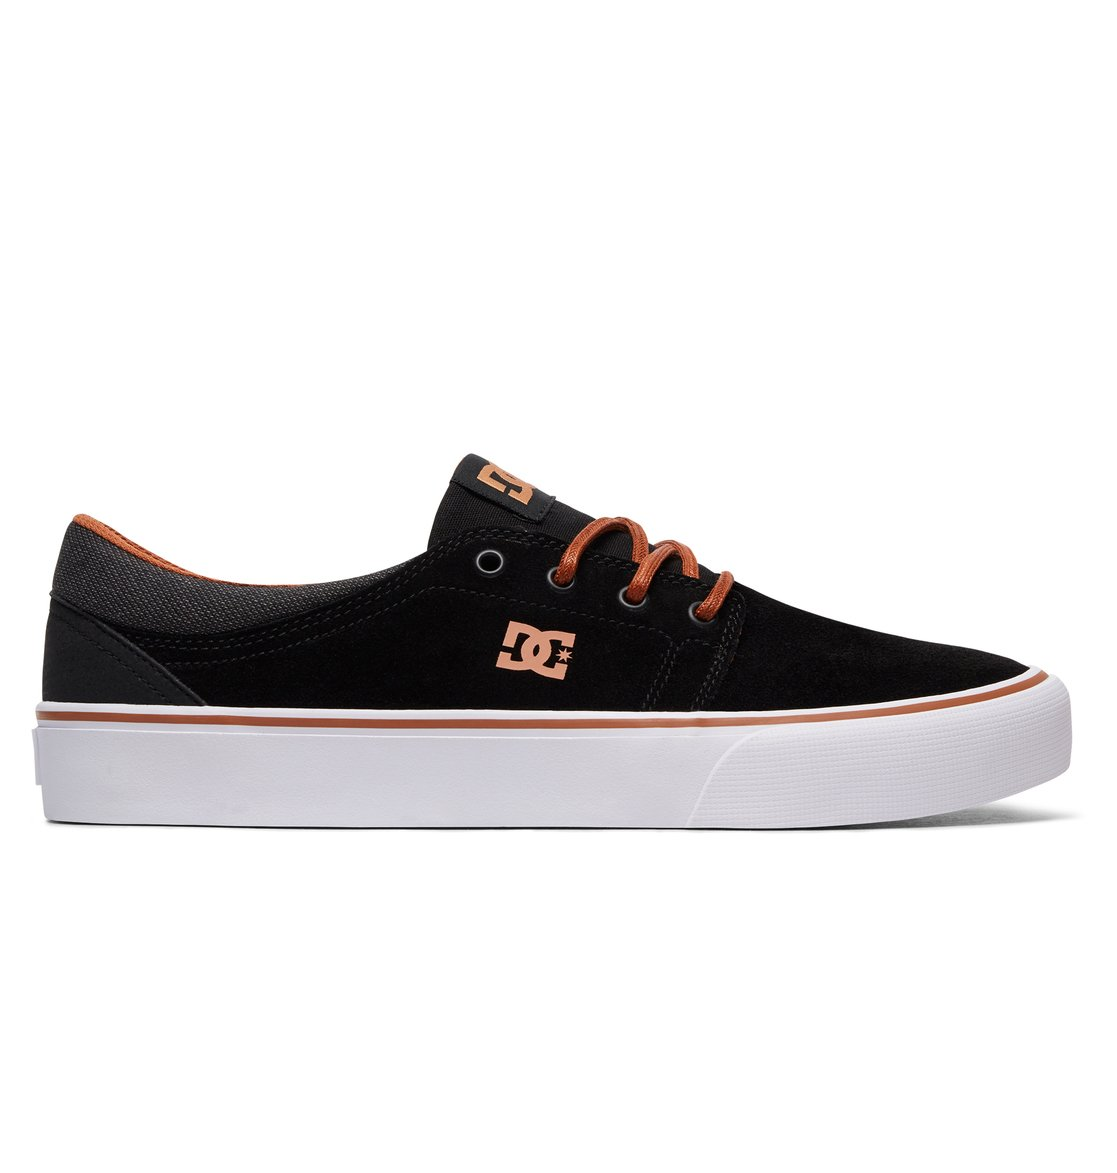 DC Shoes Trase SE - Shoes - Zapatos - Hombre - EU 44 XmYsBiFLq